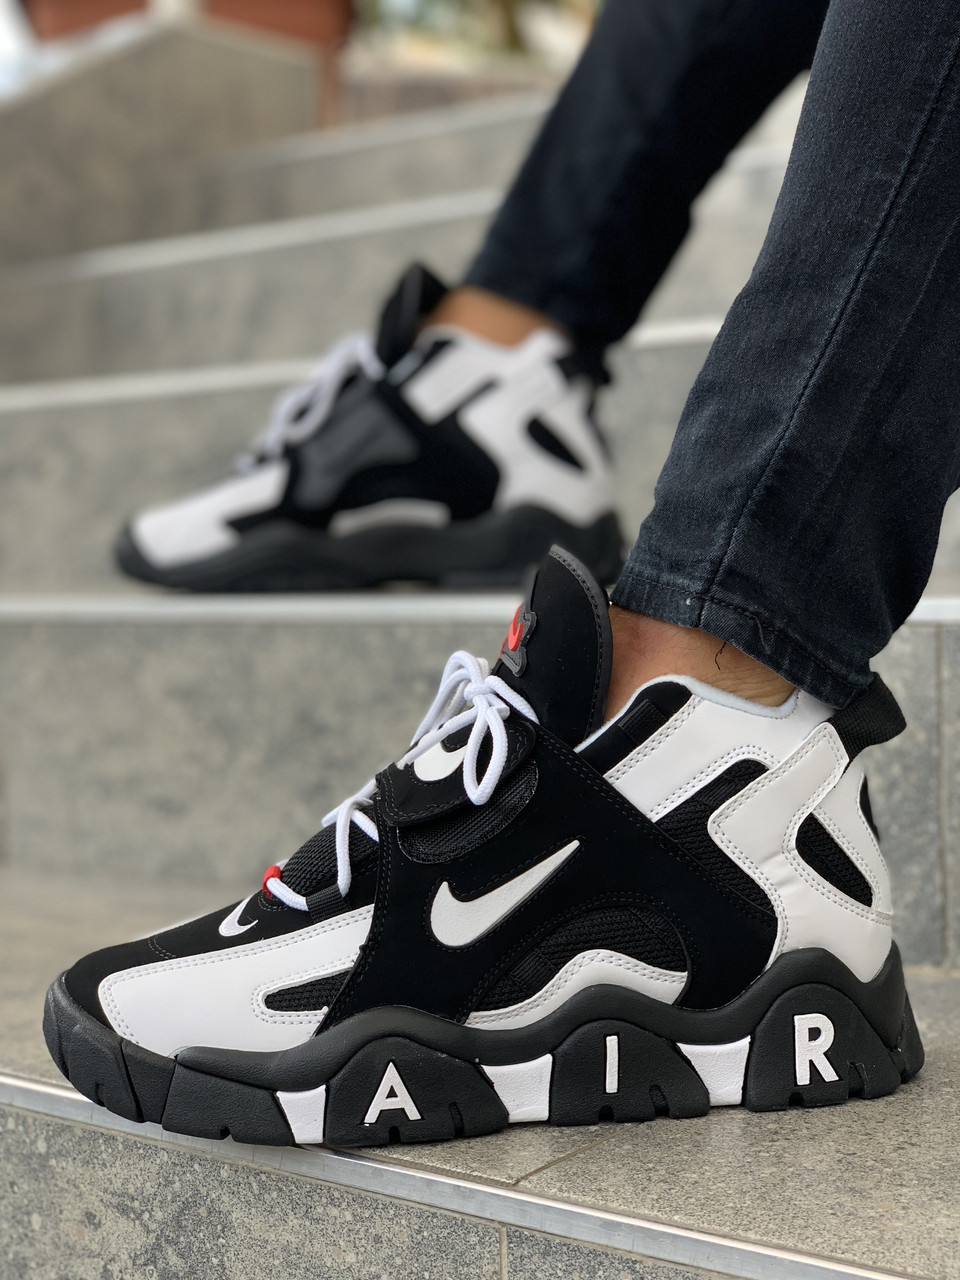 Мужские кроссовки Nike Air Max Uptempo 95, Реплика